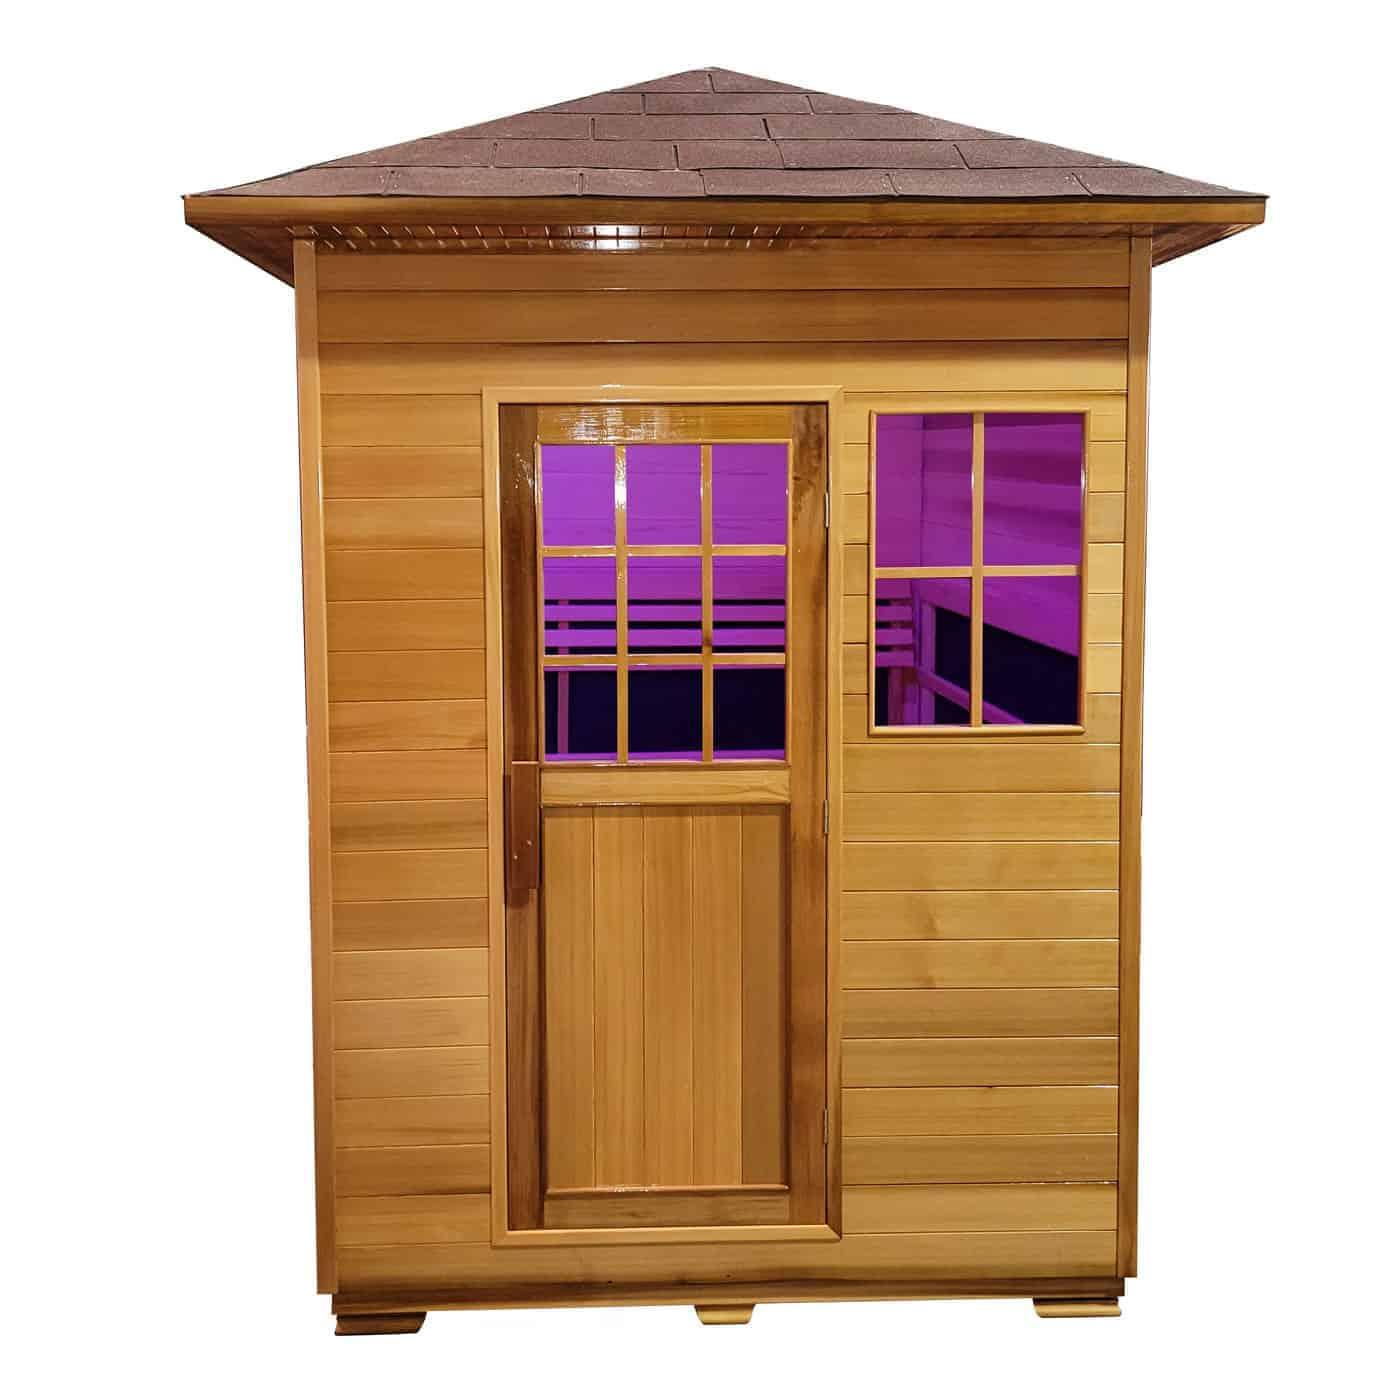 Outdoor Infrared Sauna Front View